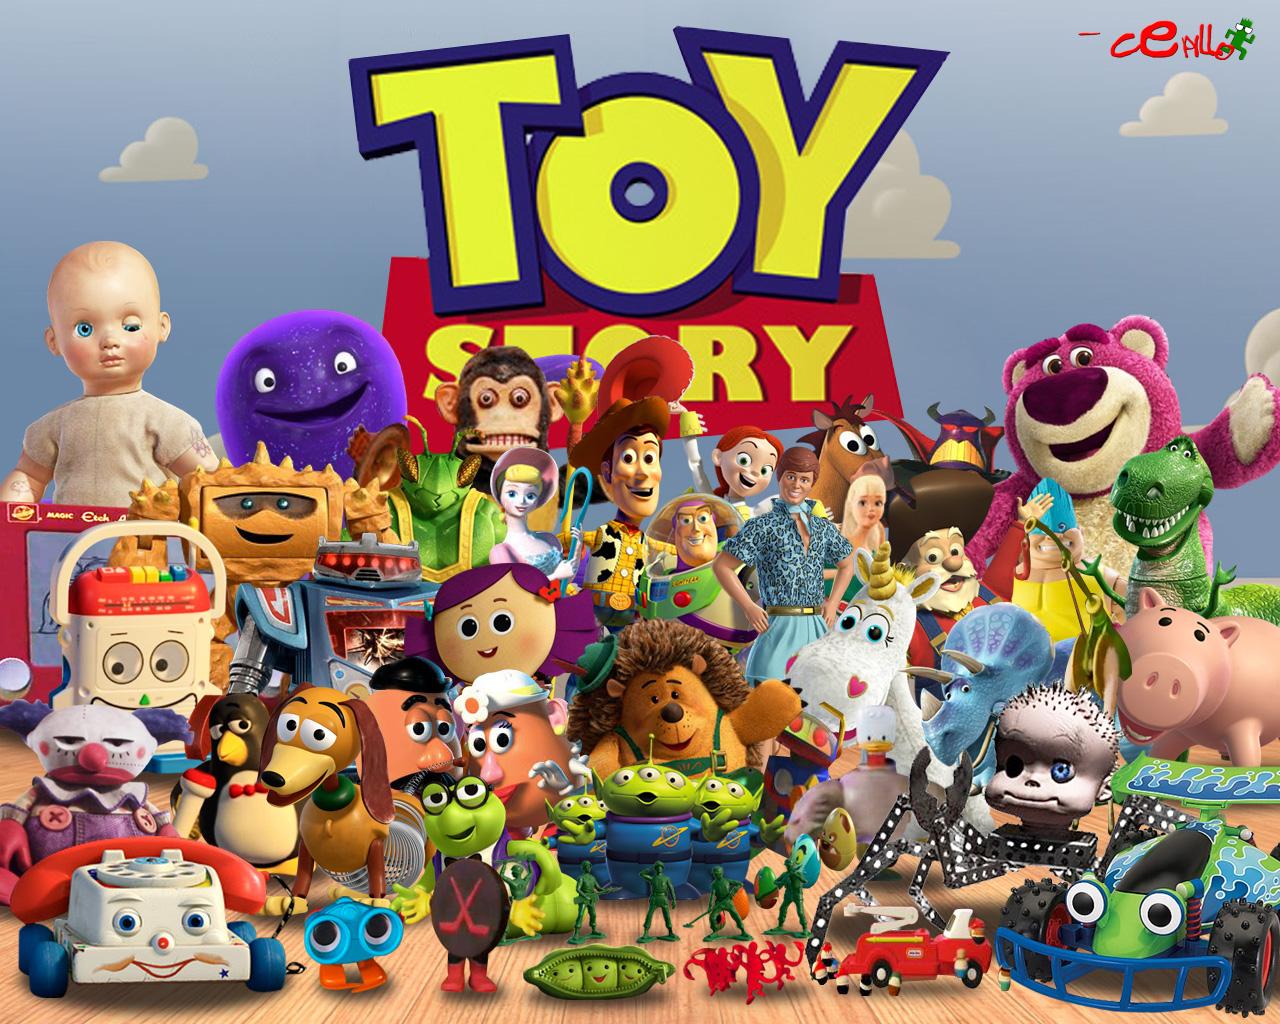 49 Toy Story 3 Wallpaper On Wallpapersafari